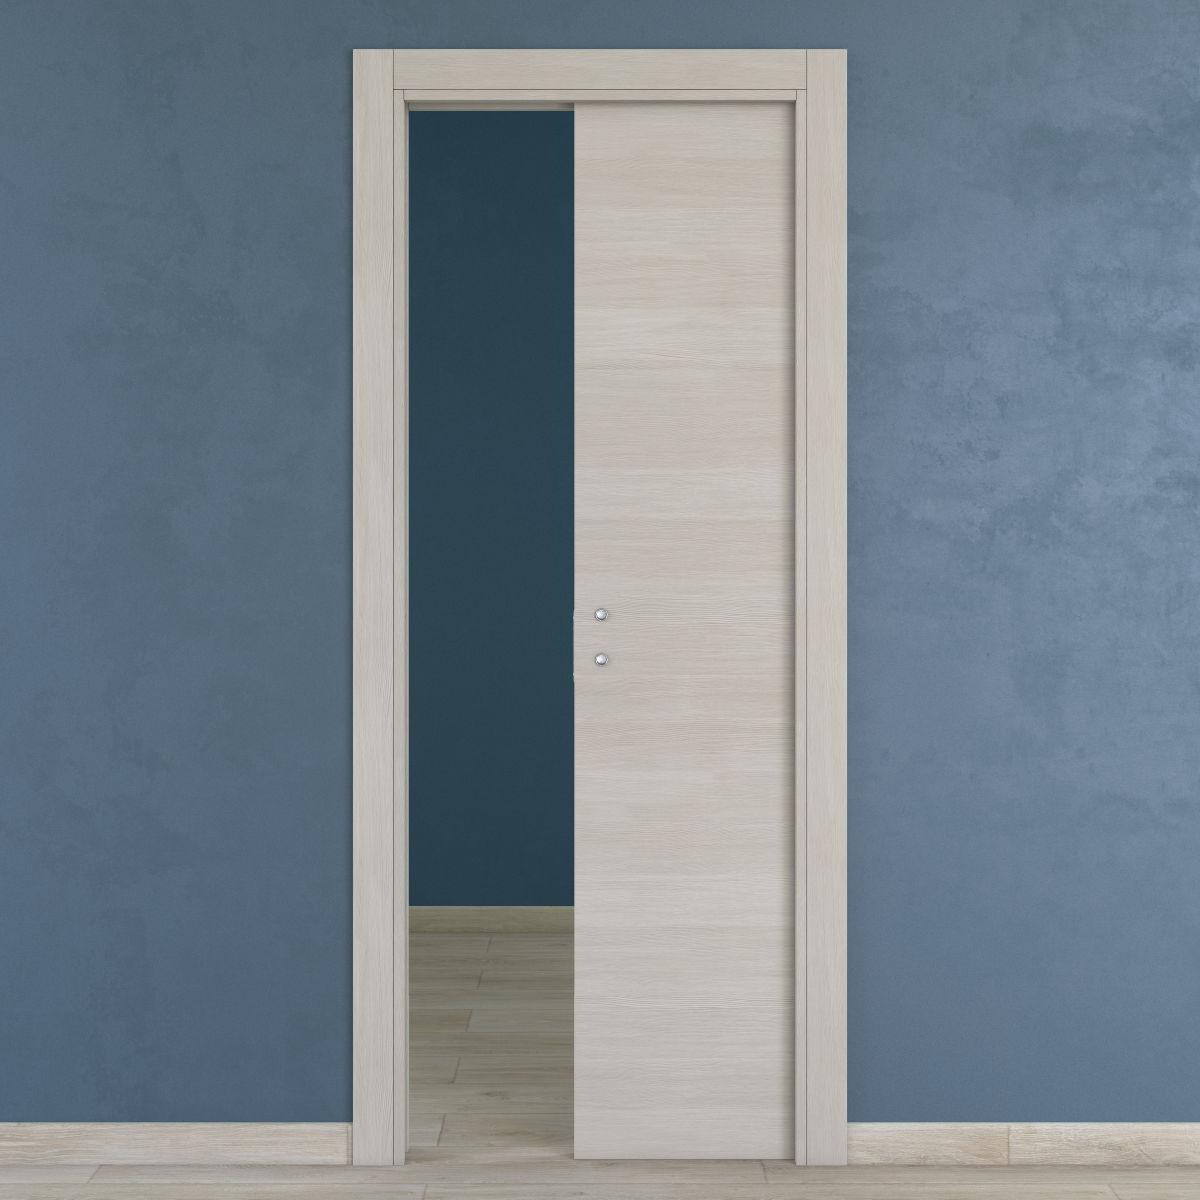 Stunning porte interne scorrevoli prezzi ideas for Porte a scomparsa prezzi leroy merlin